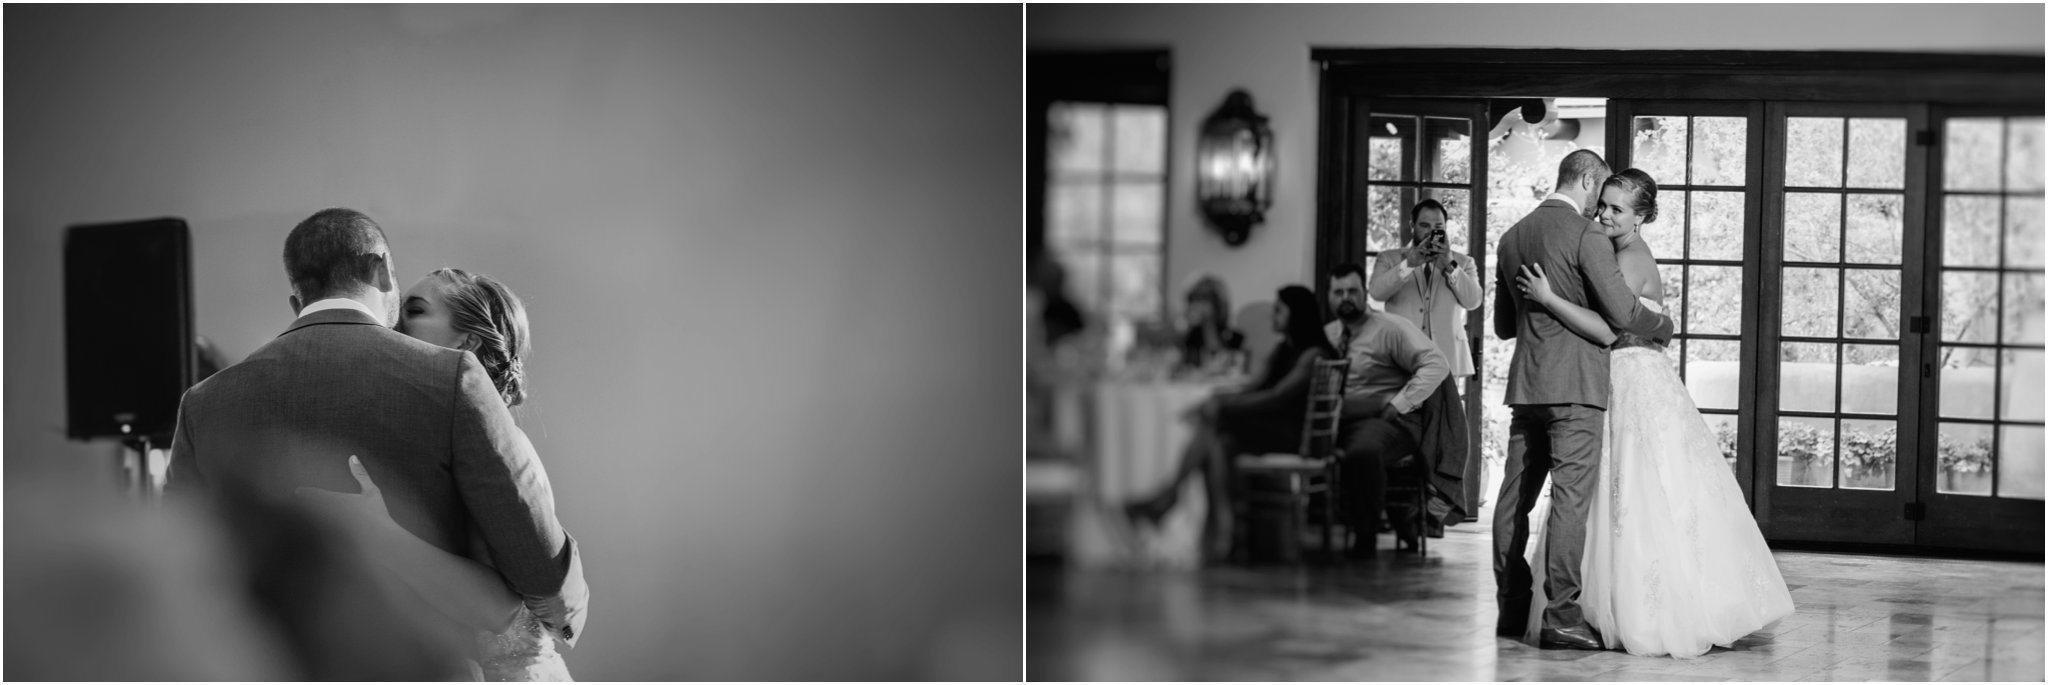 0073albuquerque-wedding-photographer_-santa-fe-wedding-photographer_-southwest-wedding-photography_-blue-rose-studio